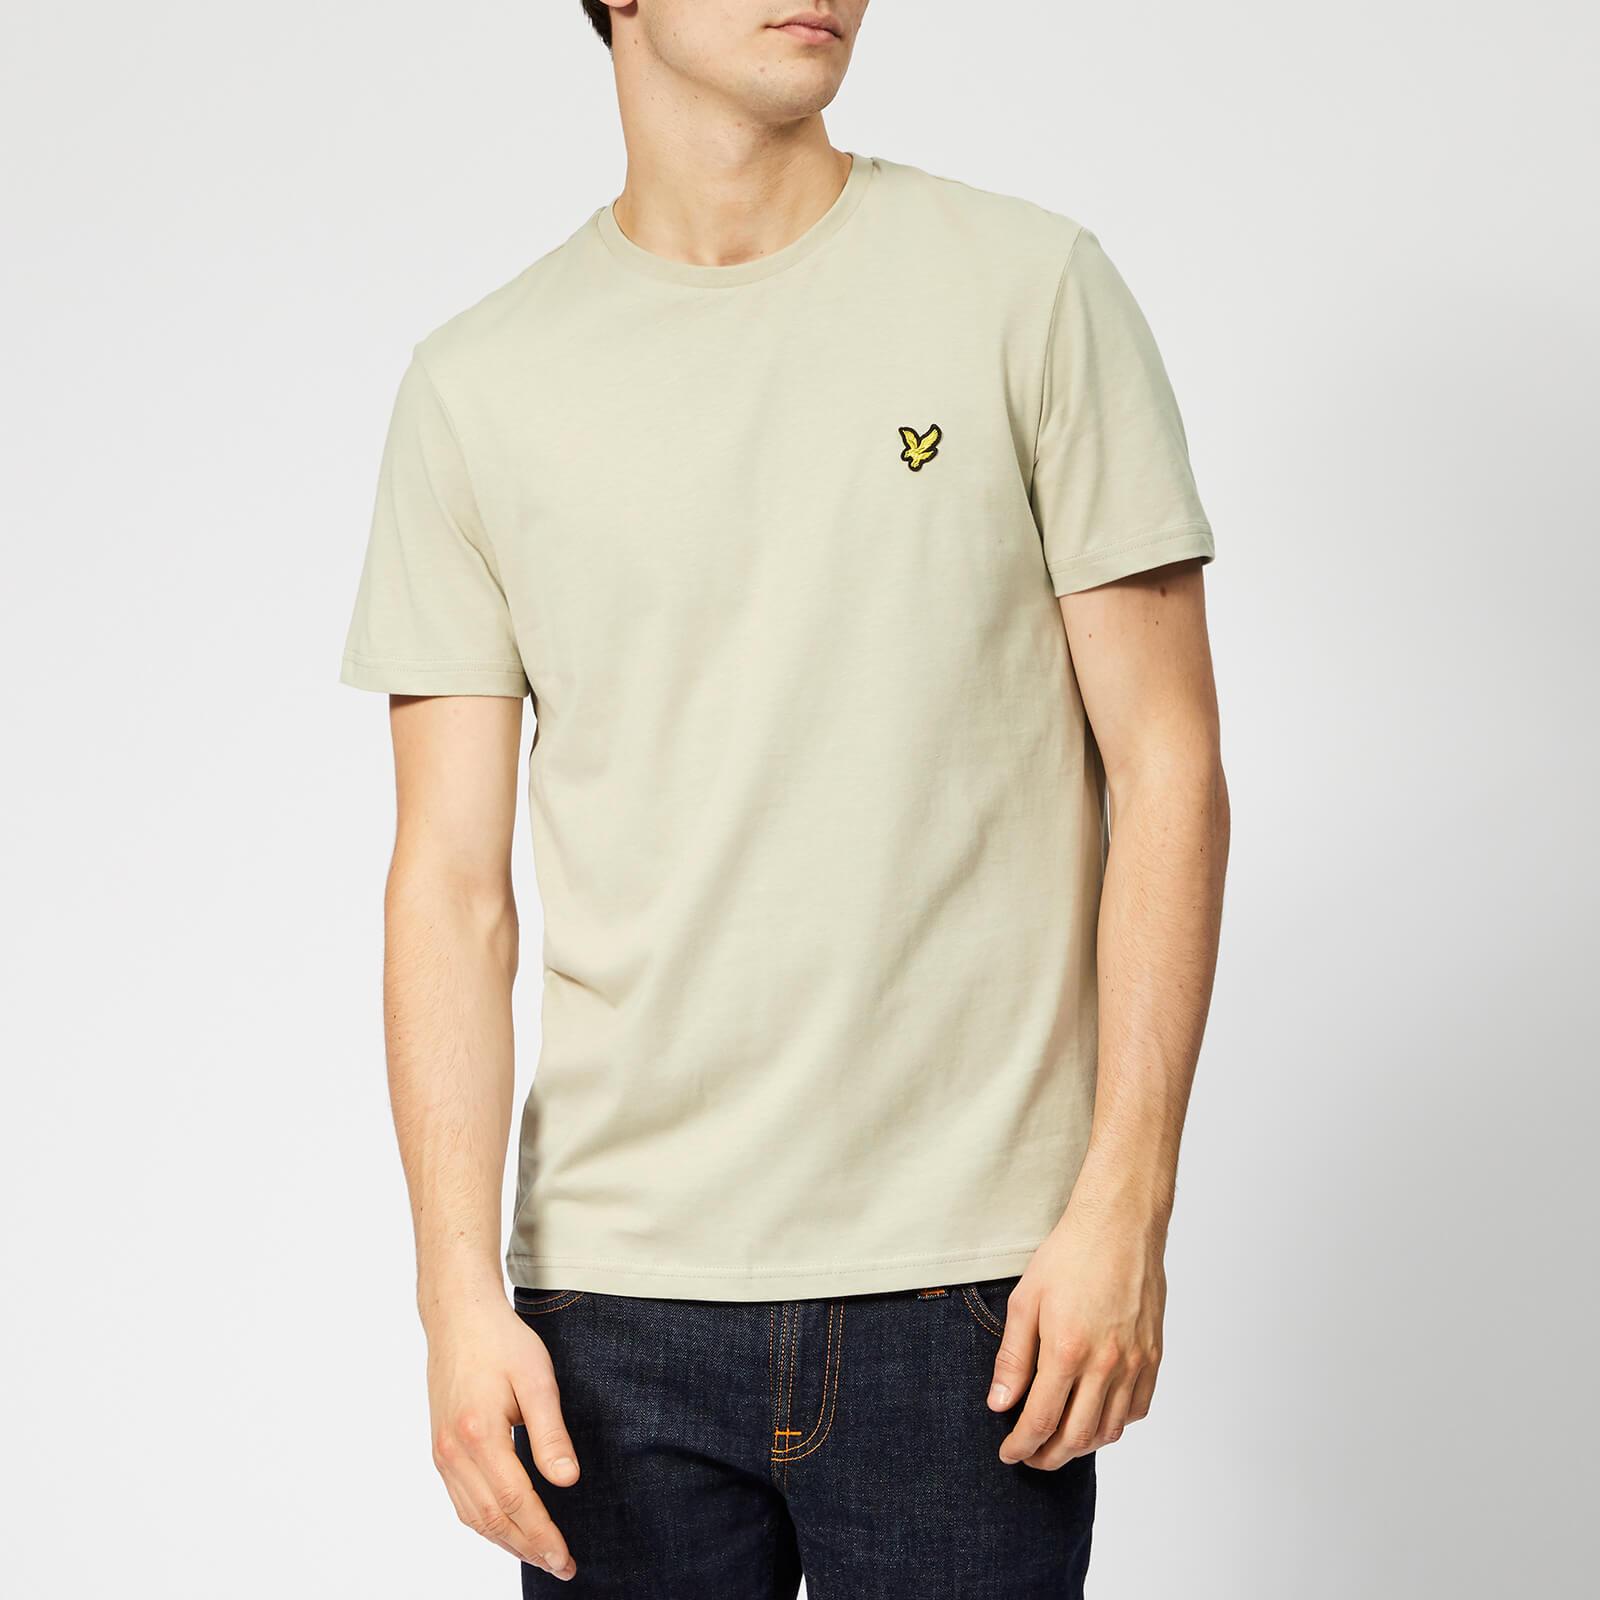 fd26d27a54256 Lyle & Scott Men's Plain T-Shirt - Green Stone Clothing | TheHut.com